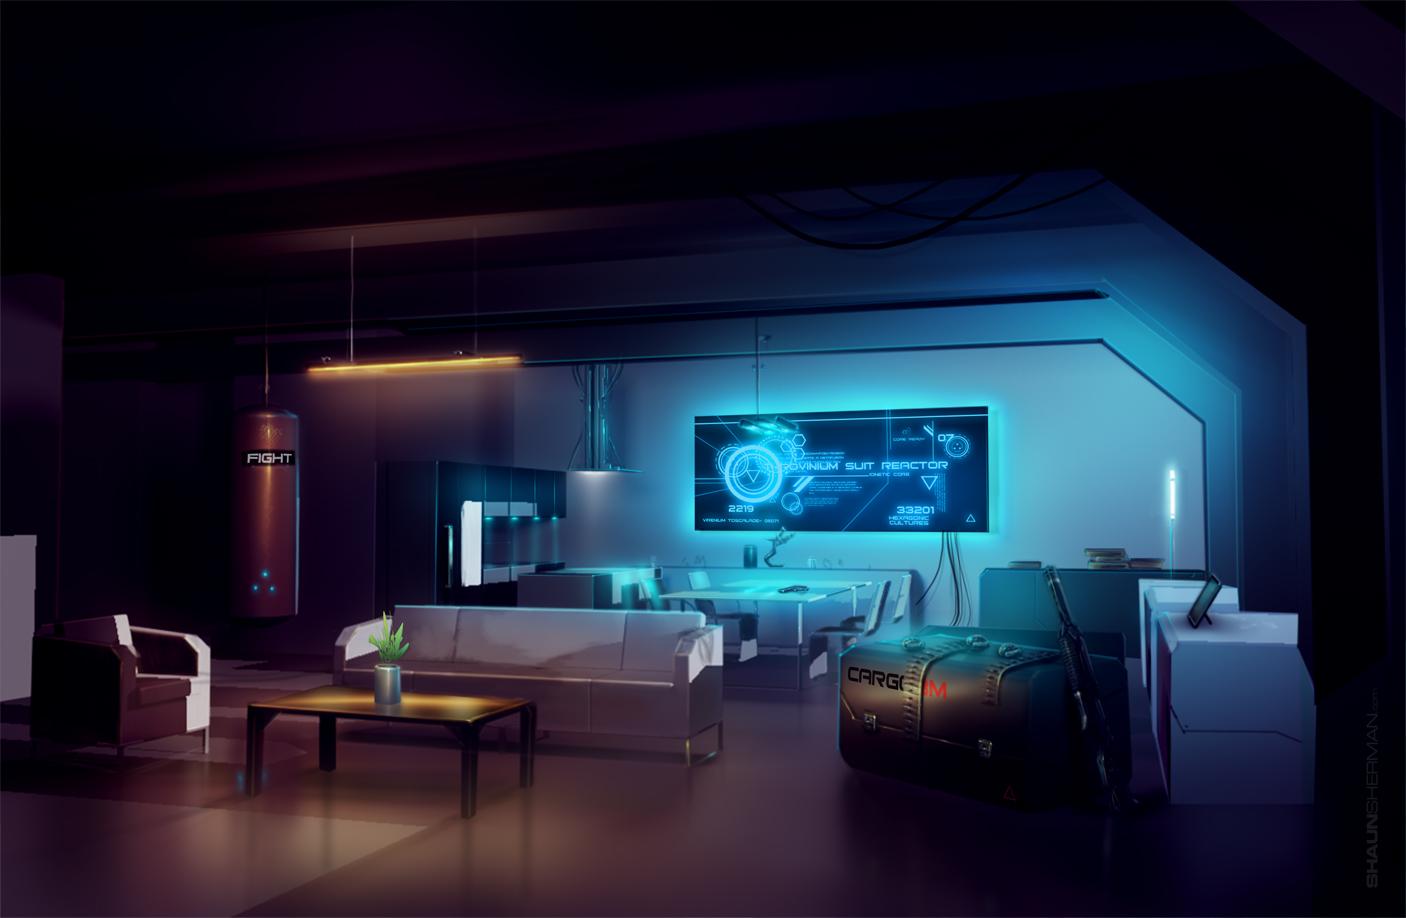 Near Future Interior Scifi Concept Art By Shaunsherman On